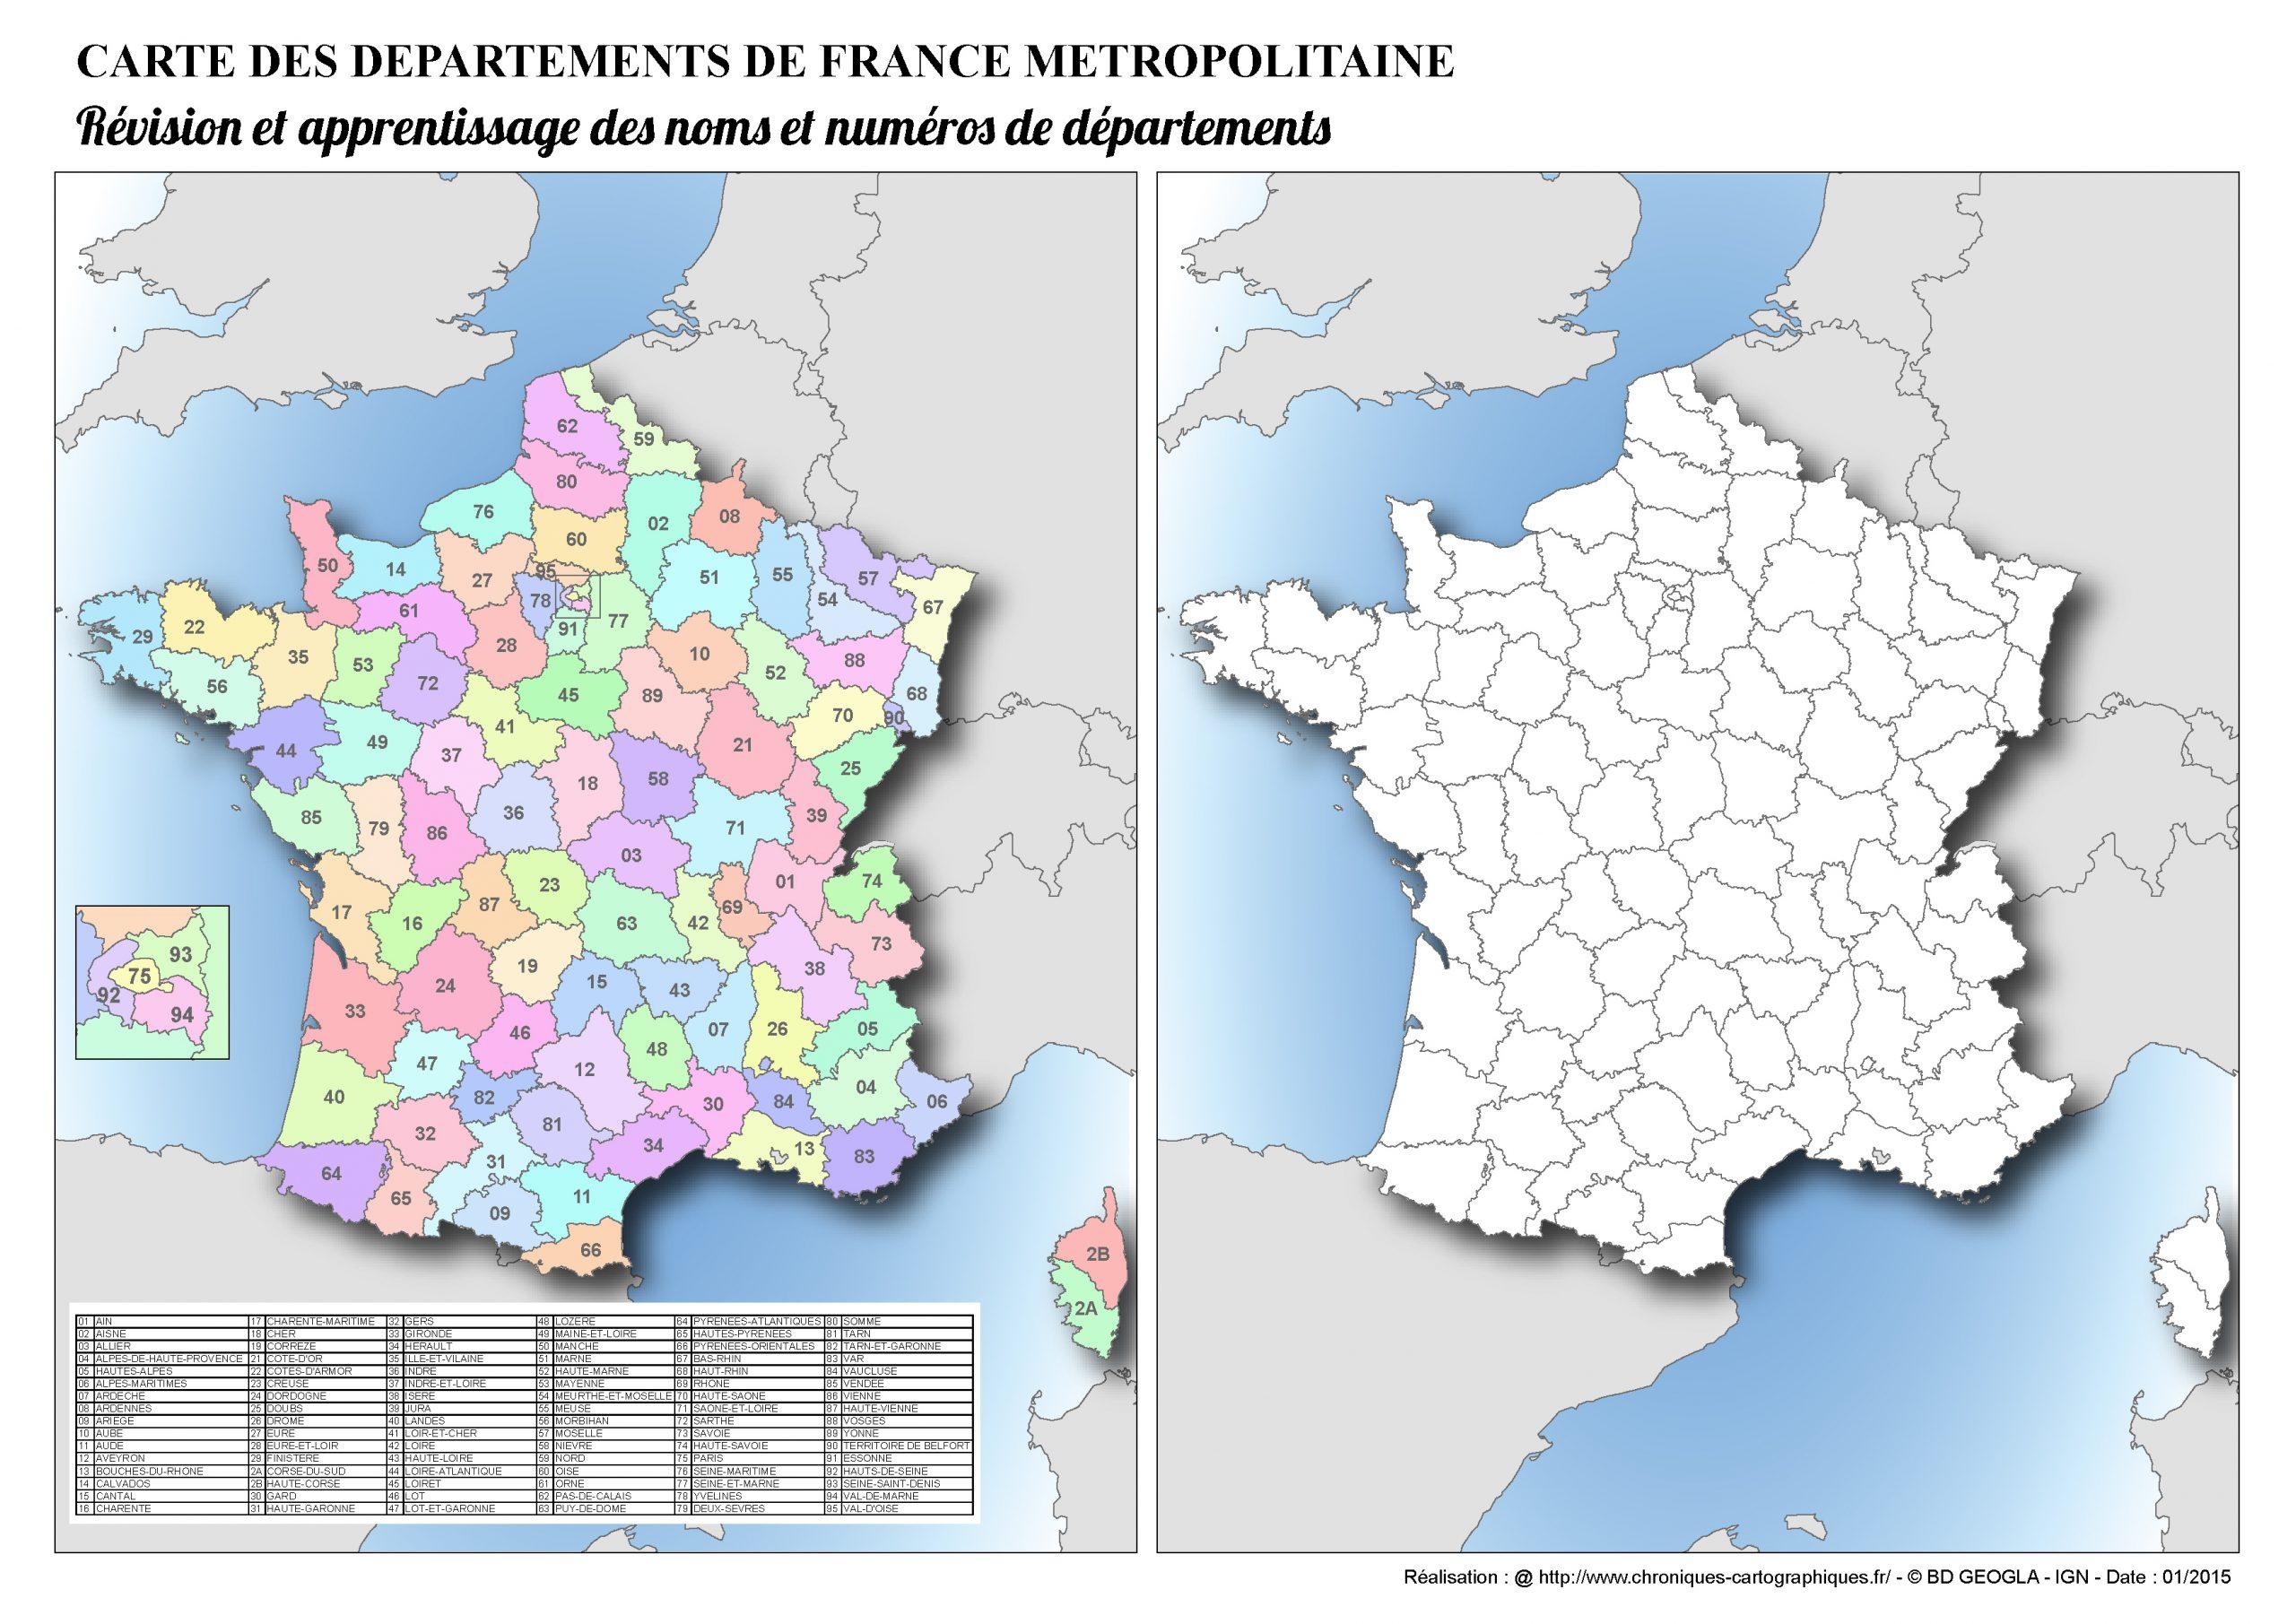 Cartes Muettes De La France À Imprimer - Chroniques tout Carte Des Régions De France À Imprimer